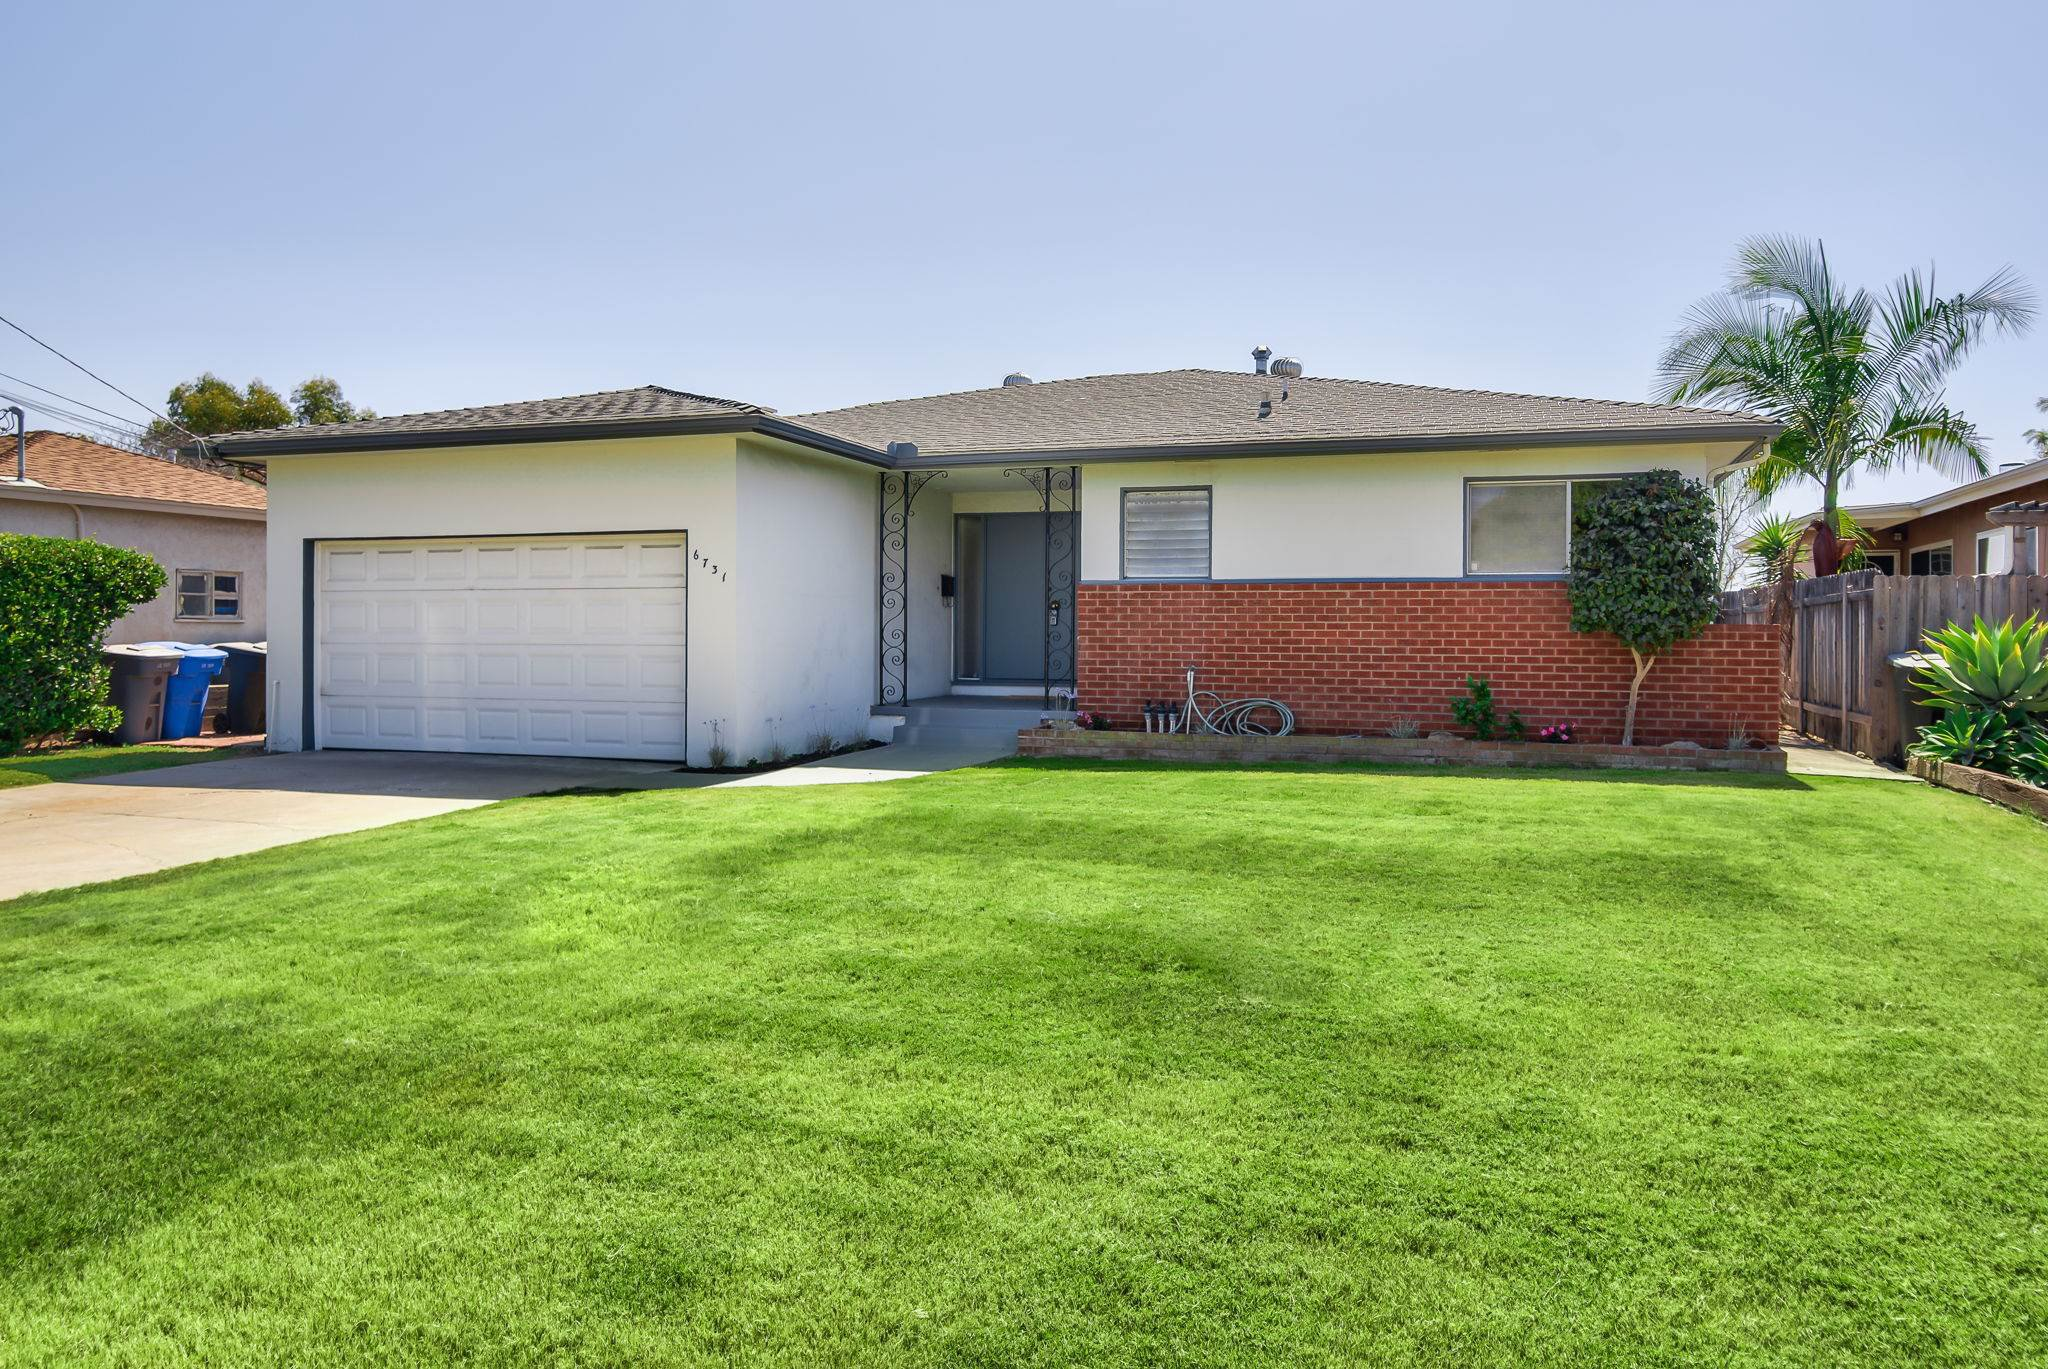 Main Photo: LA MESA House for sale : 3 bedrooms : 6731 Vigo Dr